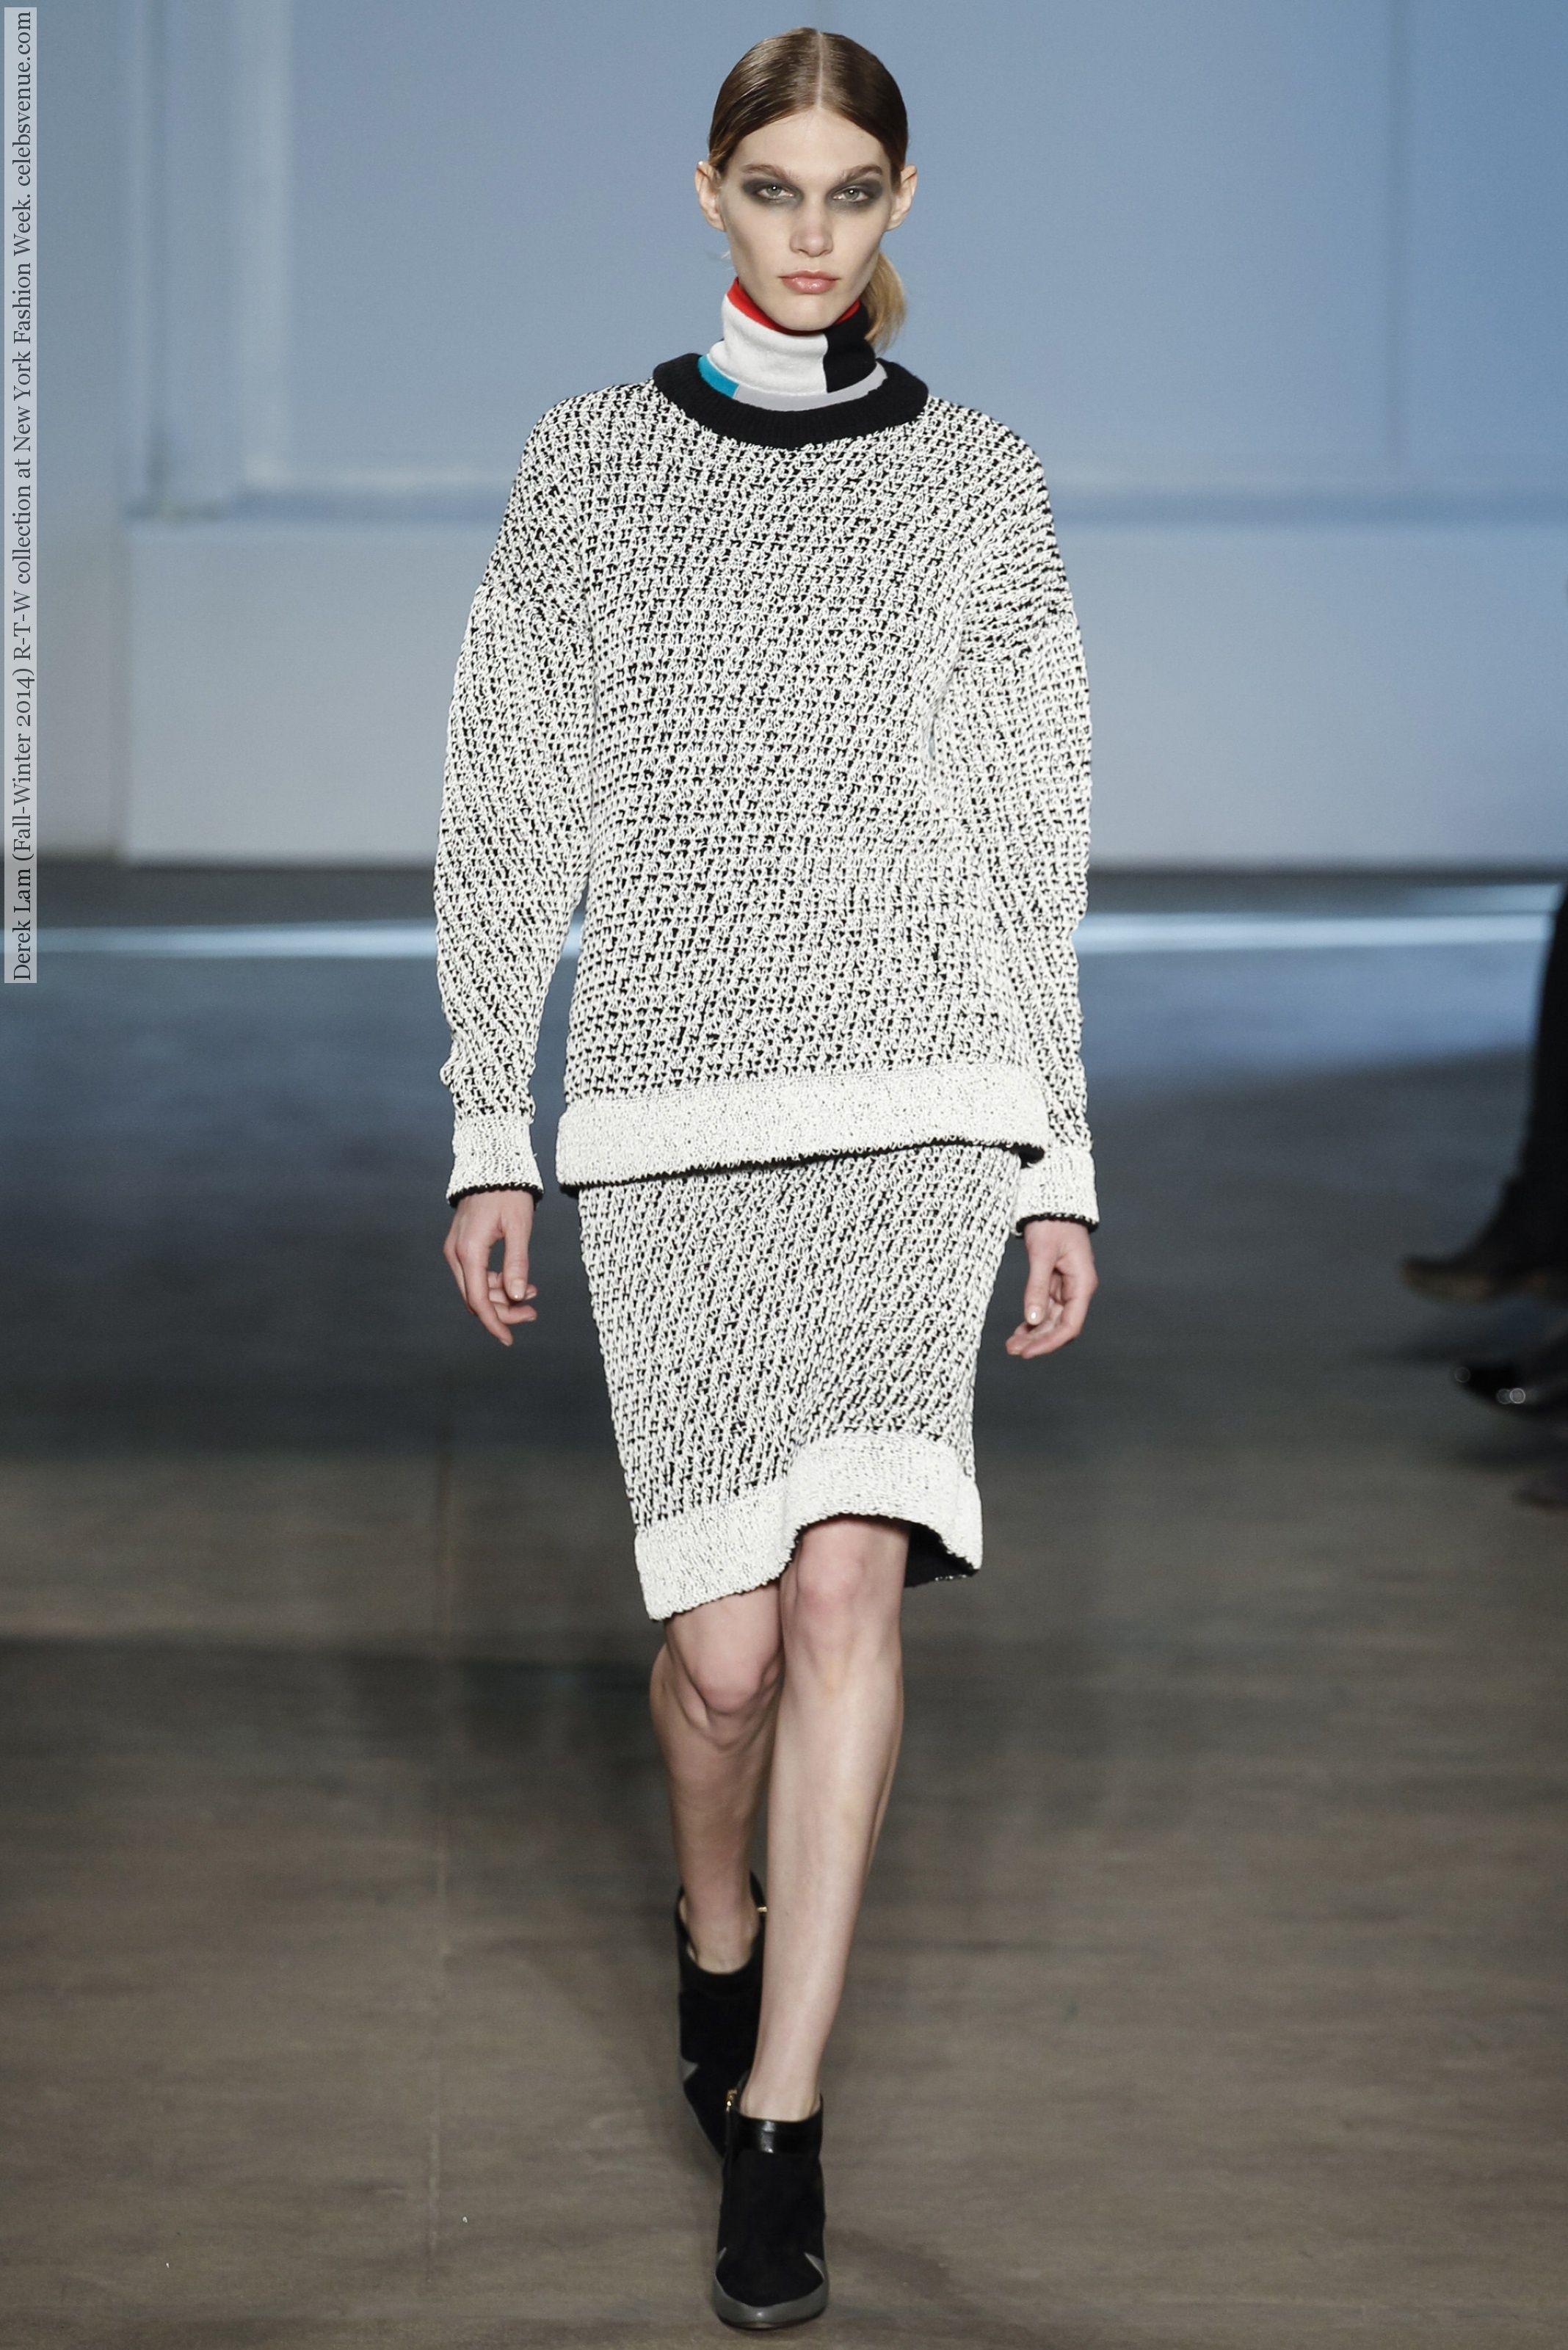 Derek Lam FallWinter 2014-2015 Collection – New York Fashion Week forecast